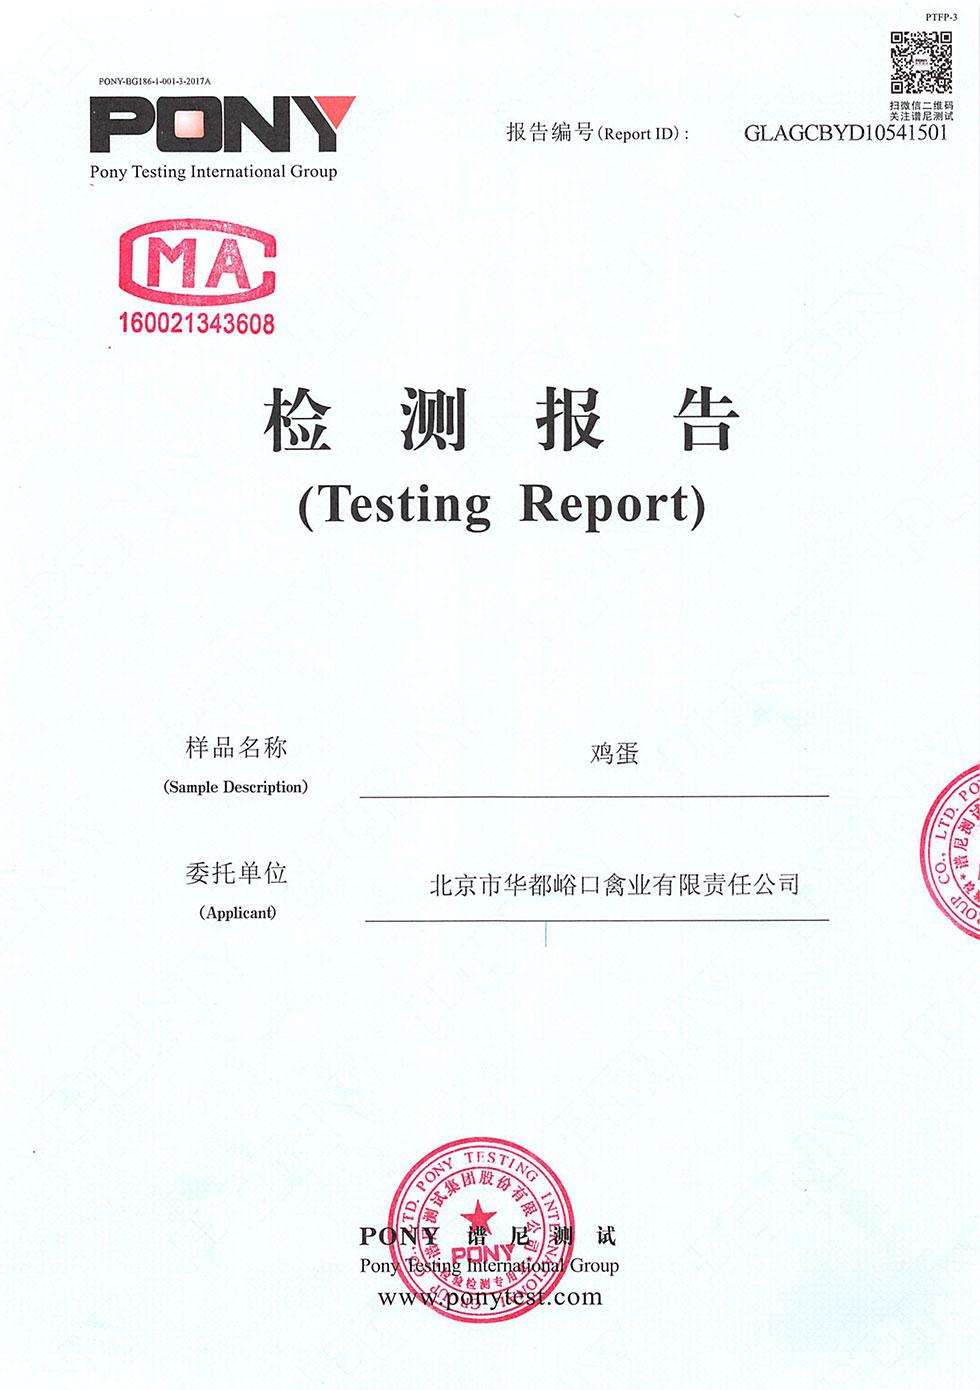 http://img.bjxxjdzg.cn/shop/article/05515530916448466.jpg